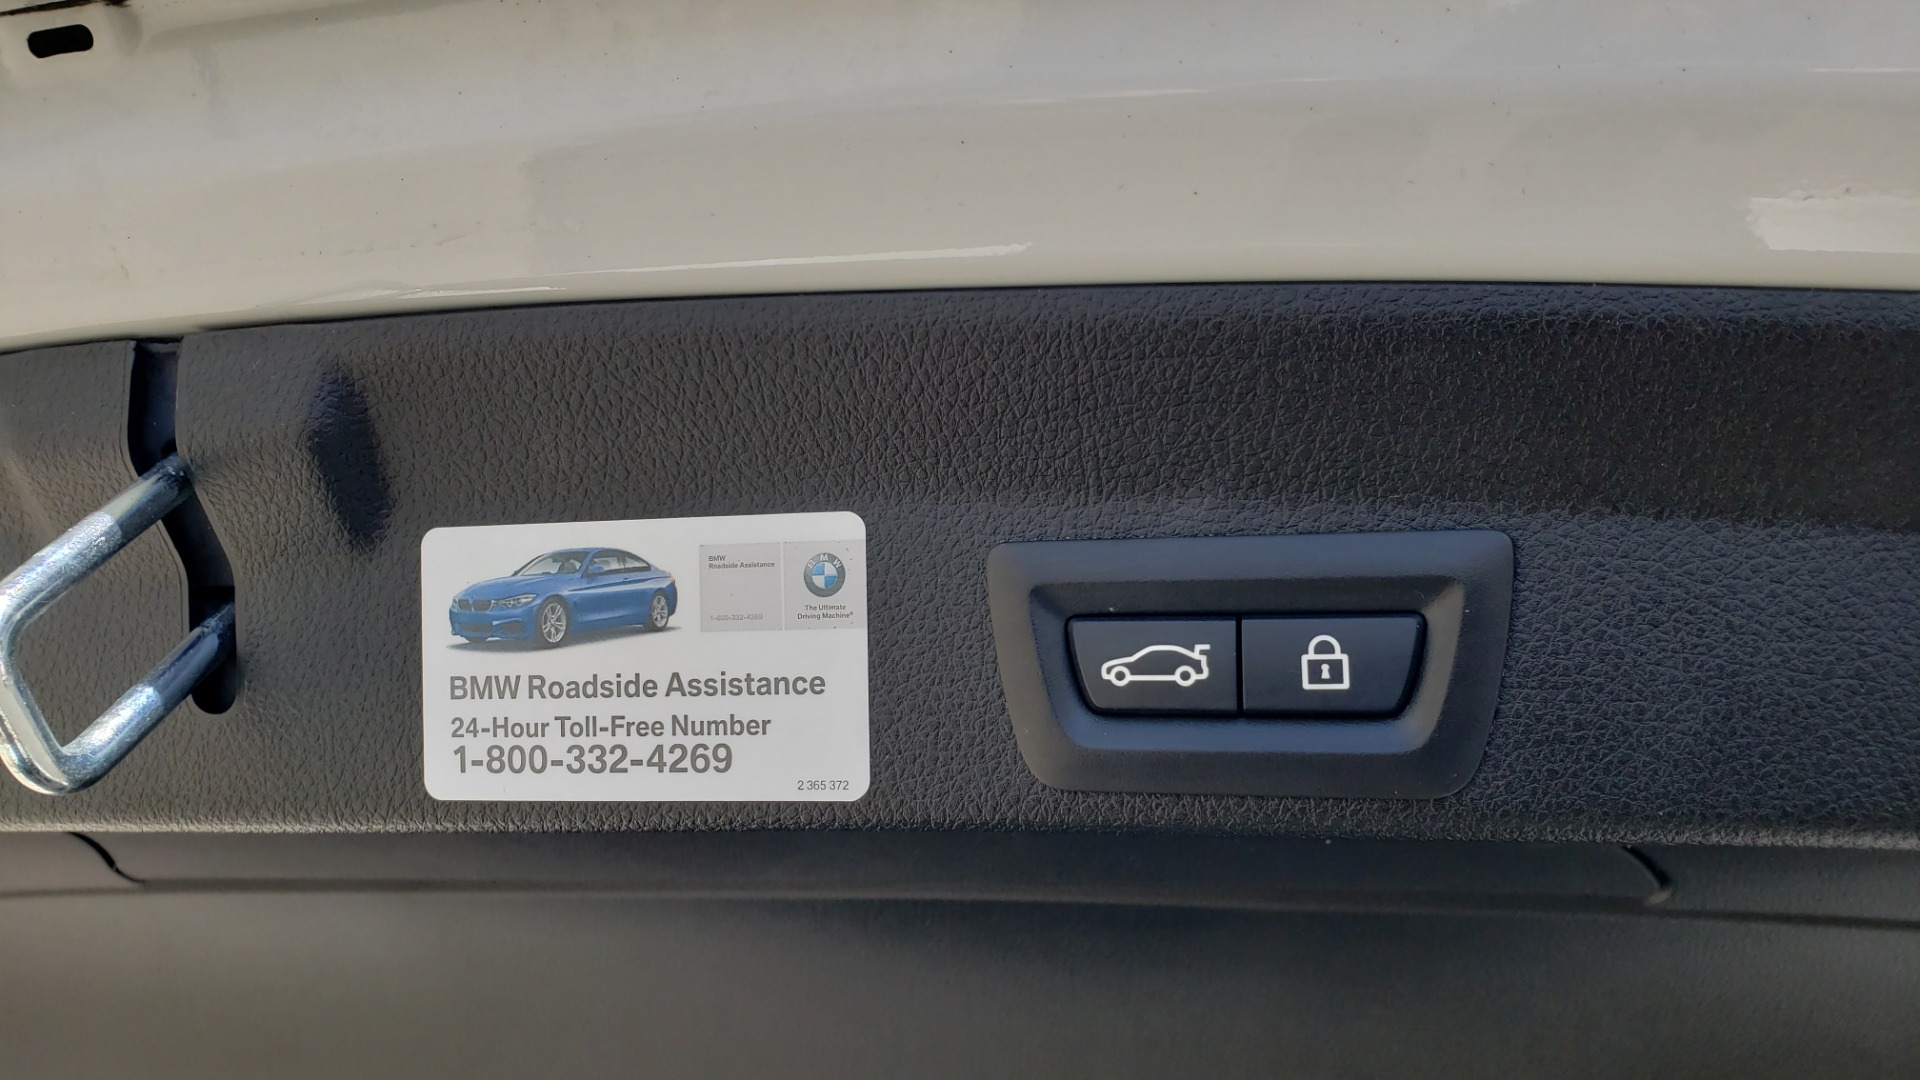 Used 2018 BMW 4 SERIES 430IXDRIVE / PREMIUM / NAV / SUNROOF / ESSENTIALS PKG for sale $28,995 at Formula Imports in Charlotte NC 28227 20